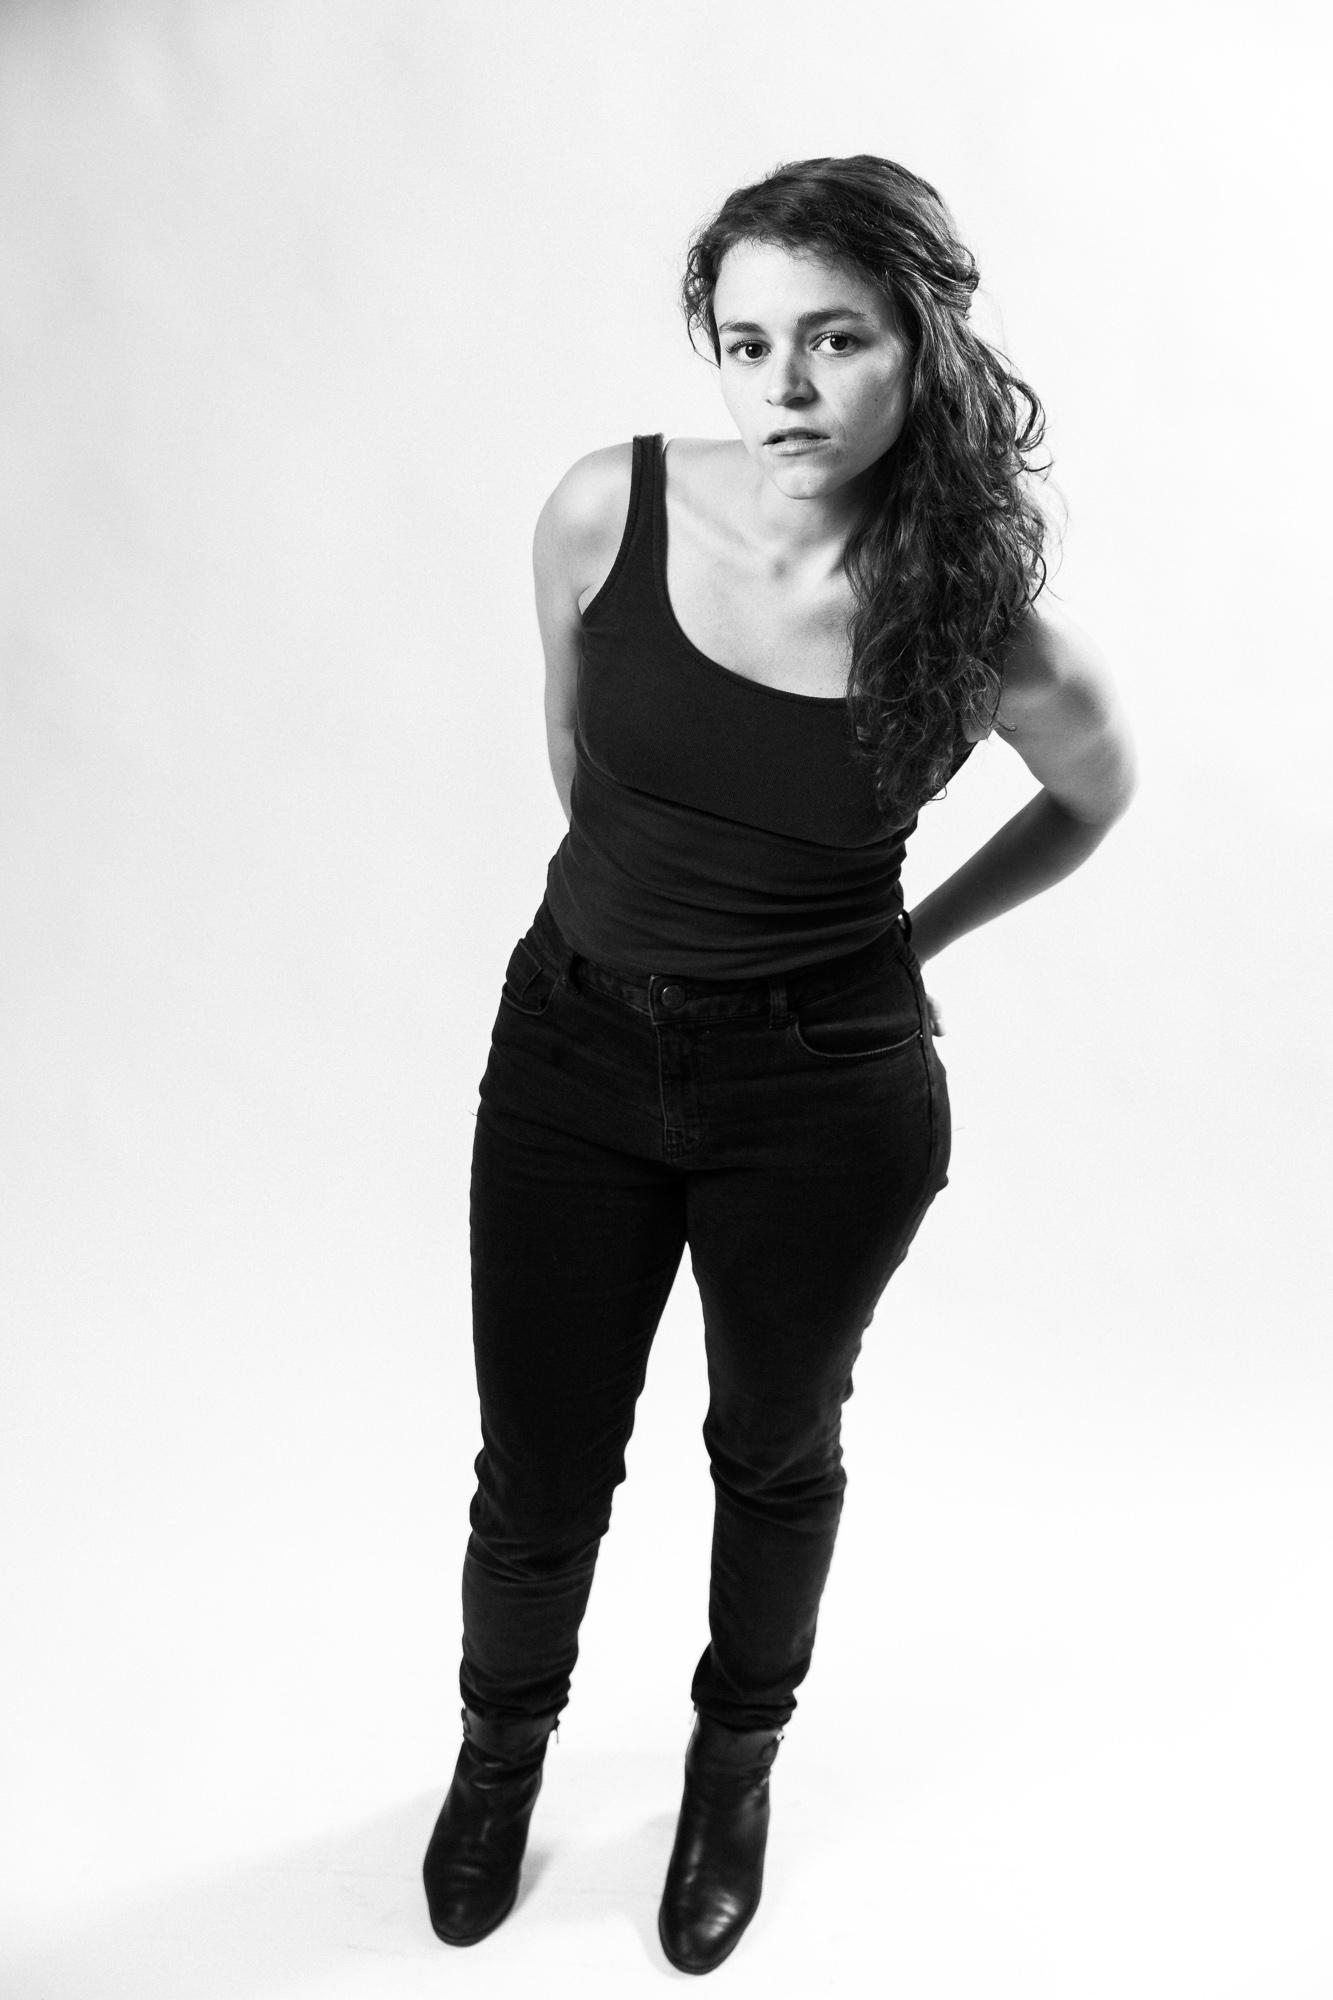 iso800-fotograaf-antwerpen-headshots-portret-stefanie-actrice-theater-portfolio